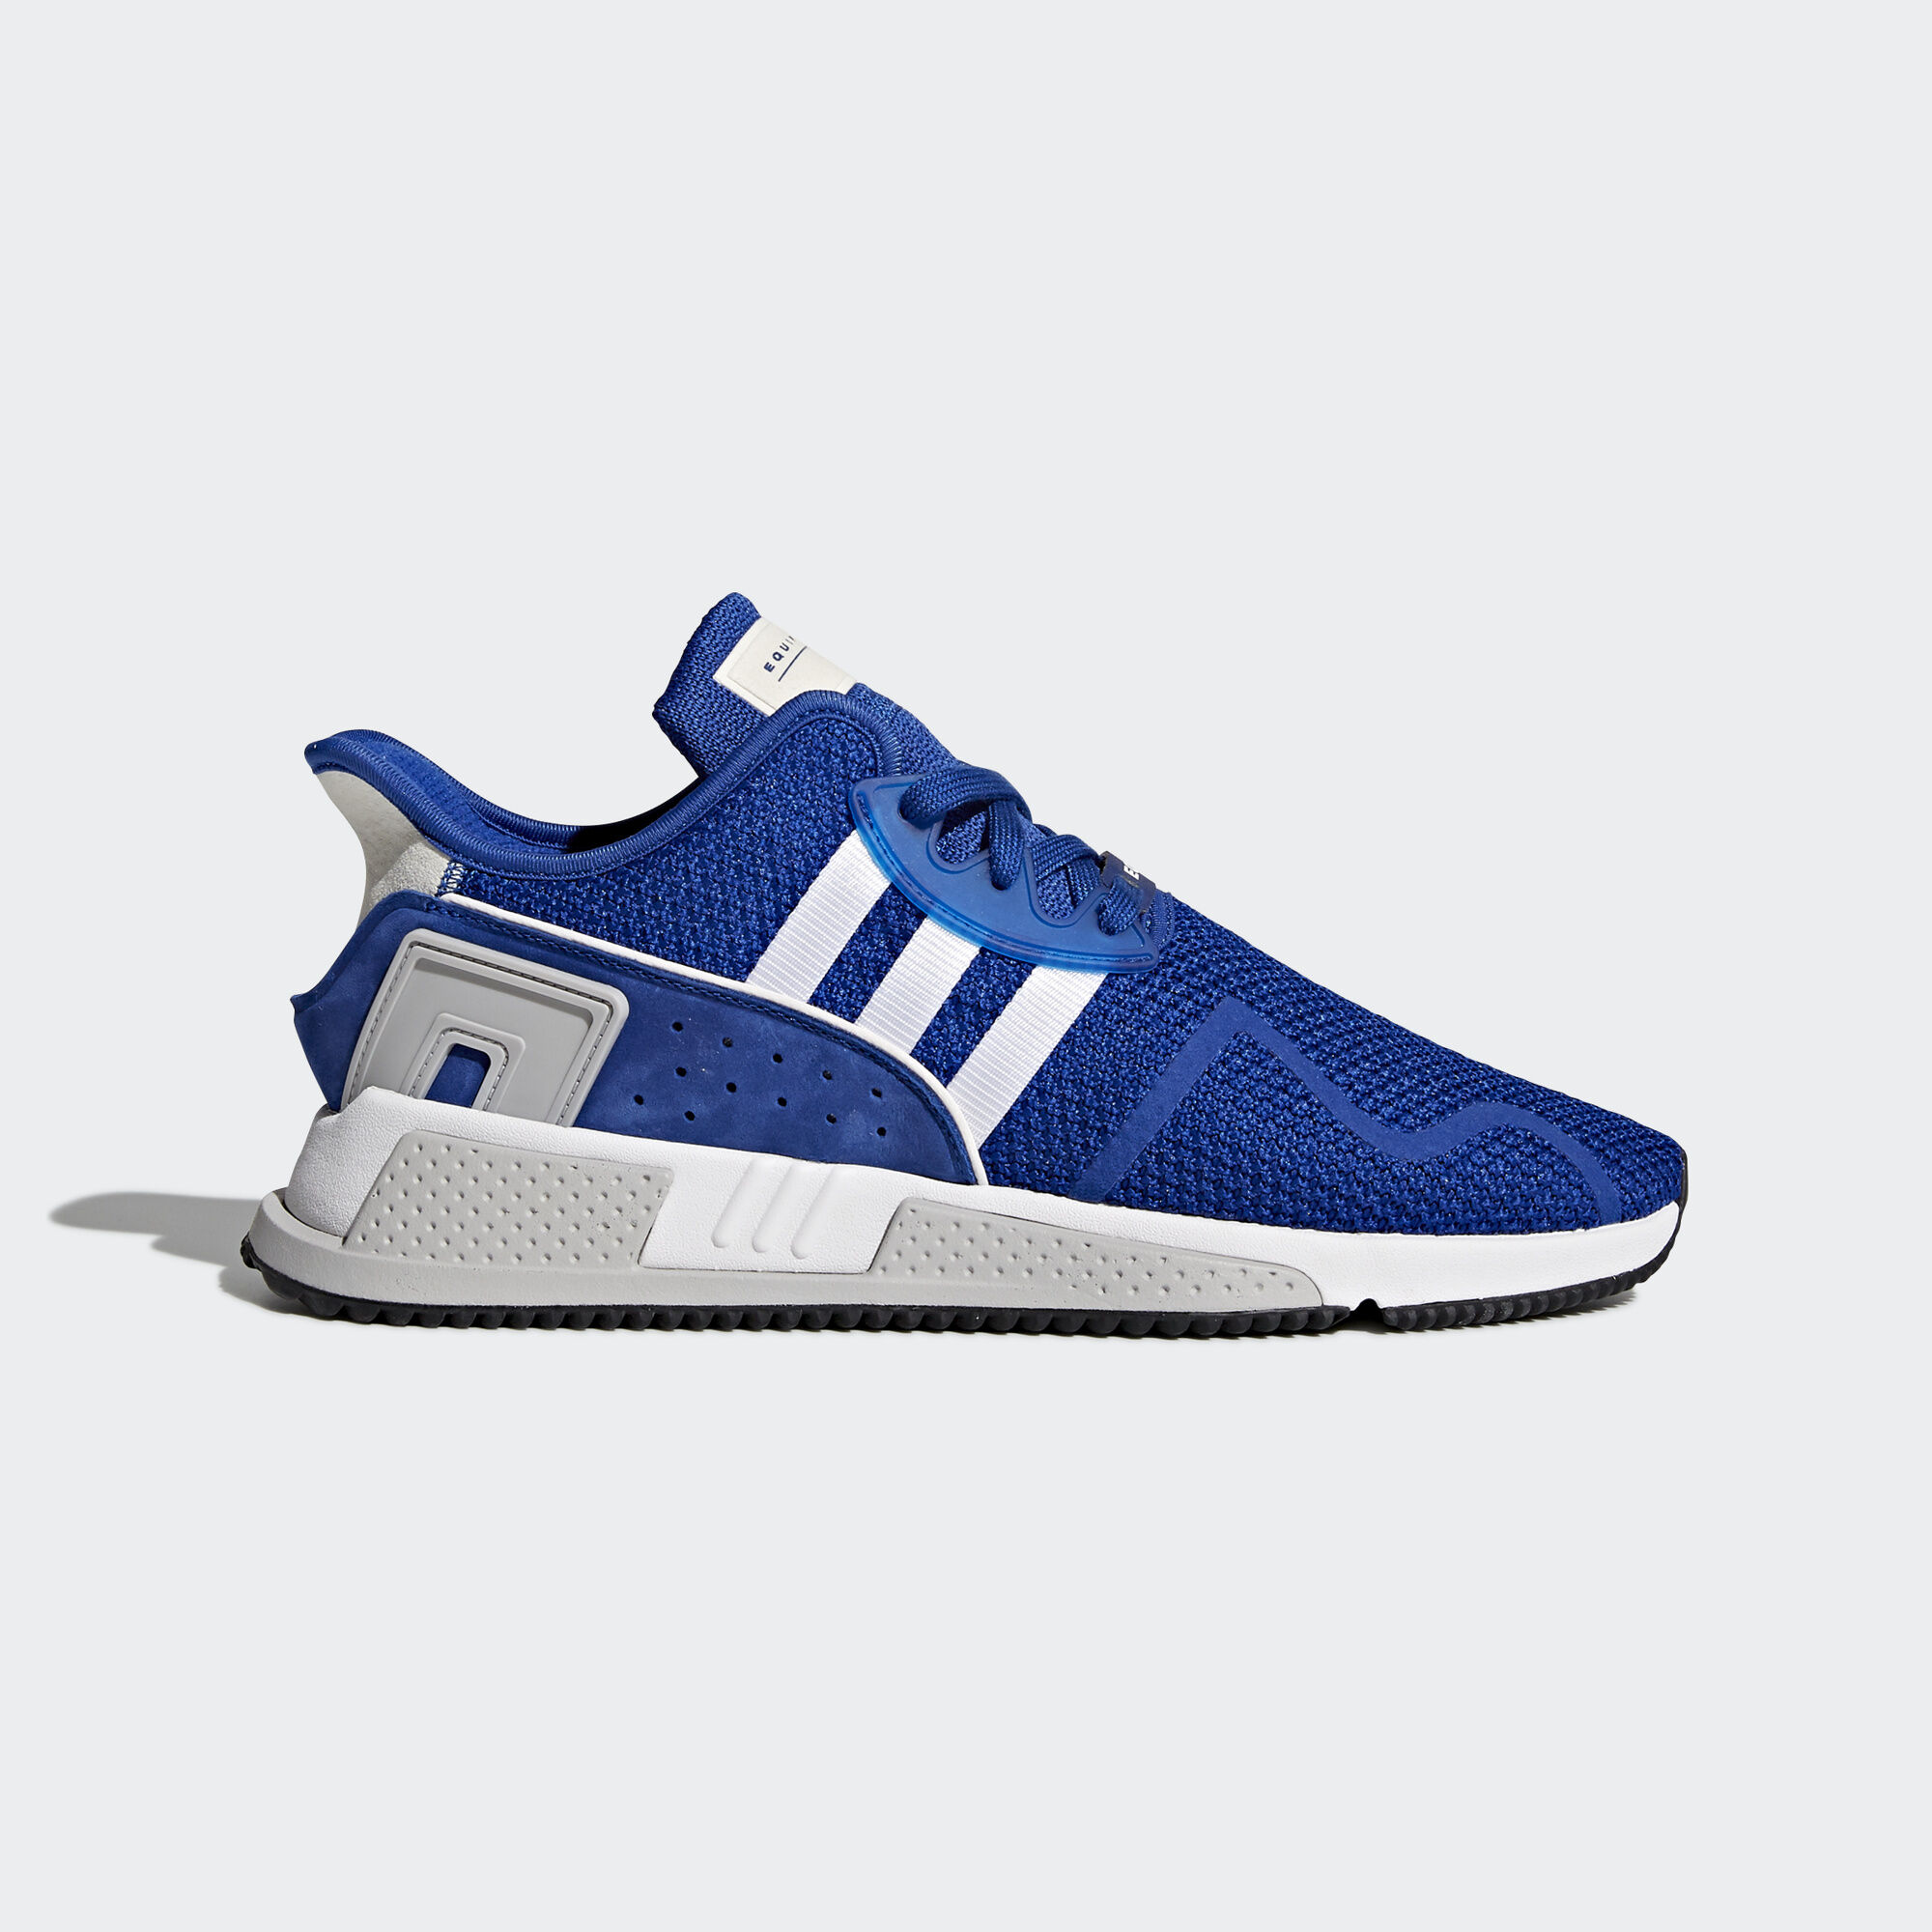 Adidas D Cushion Running Shoes